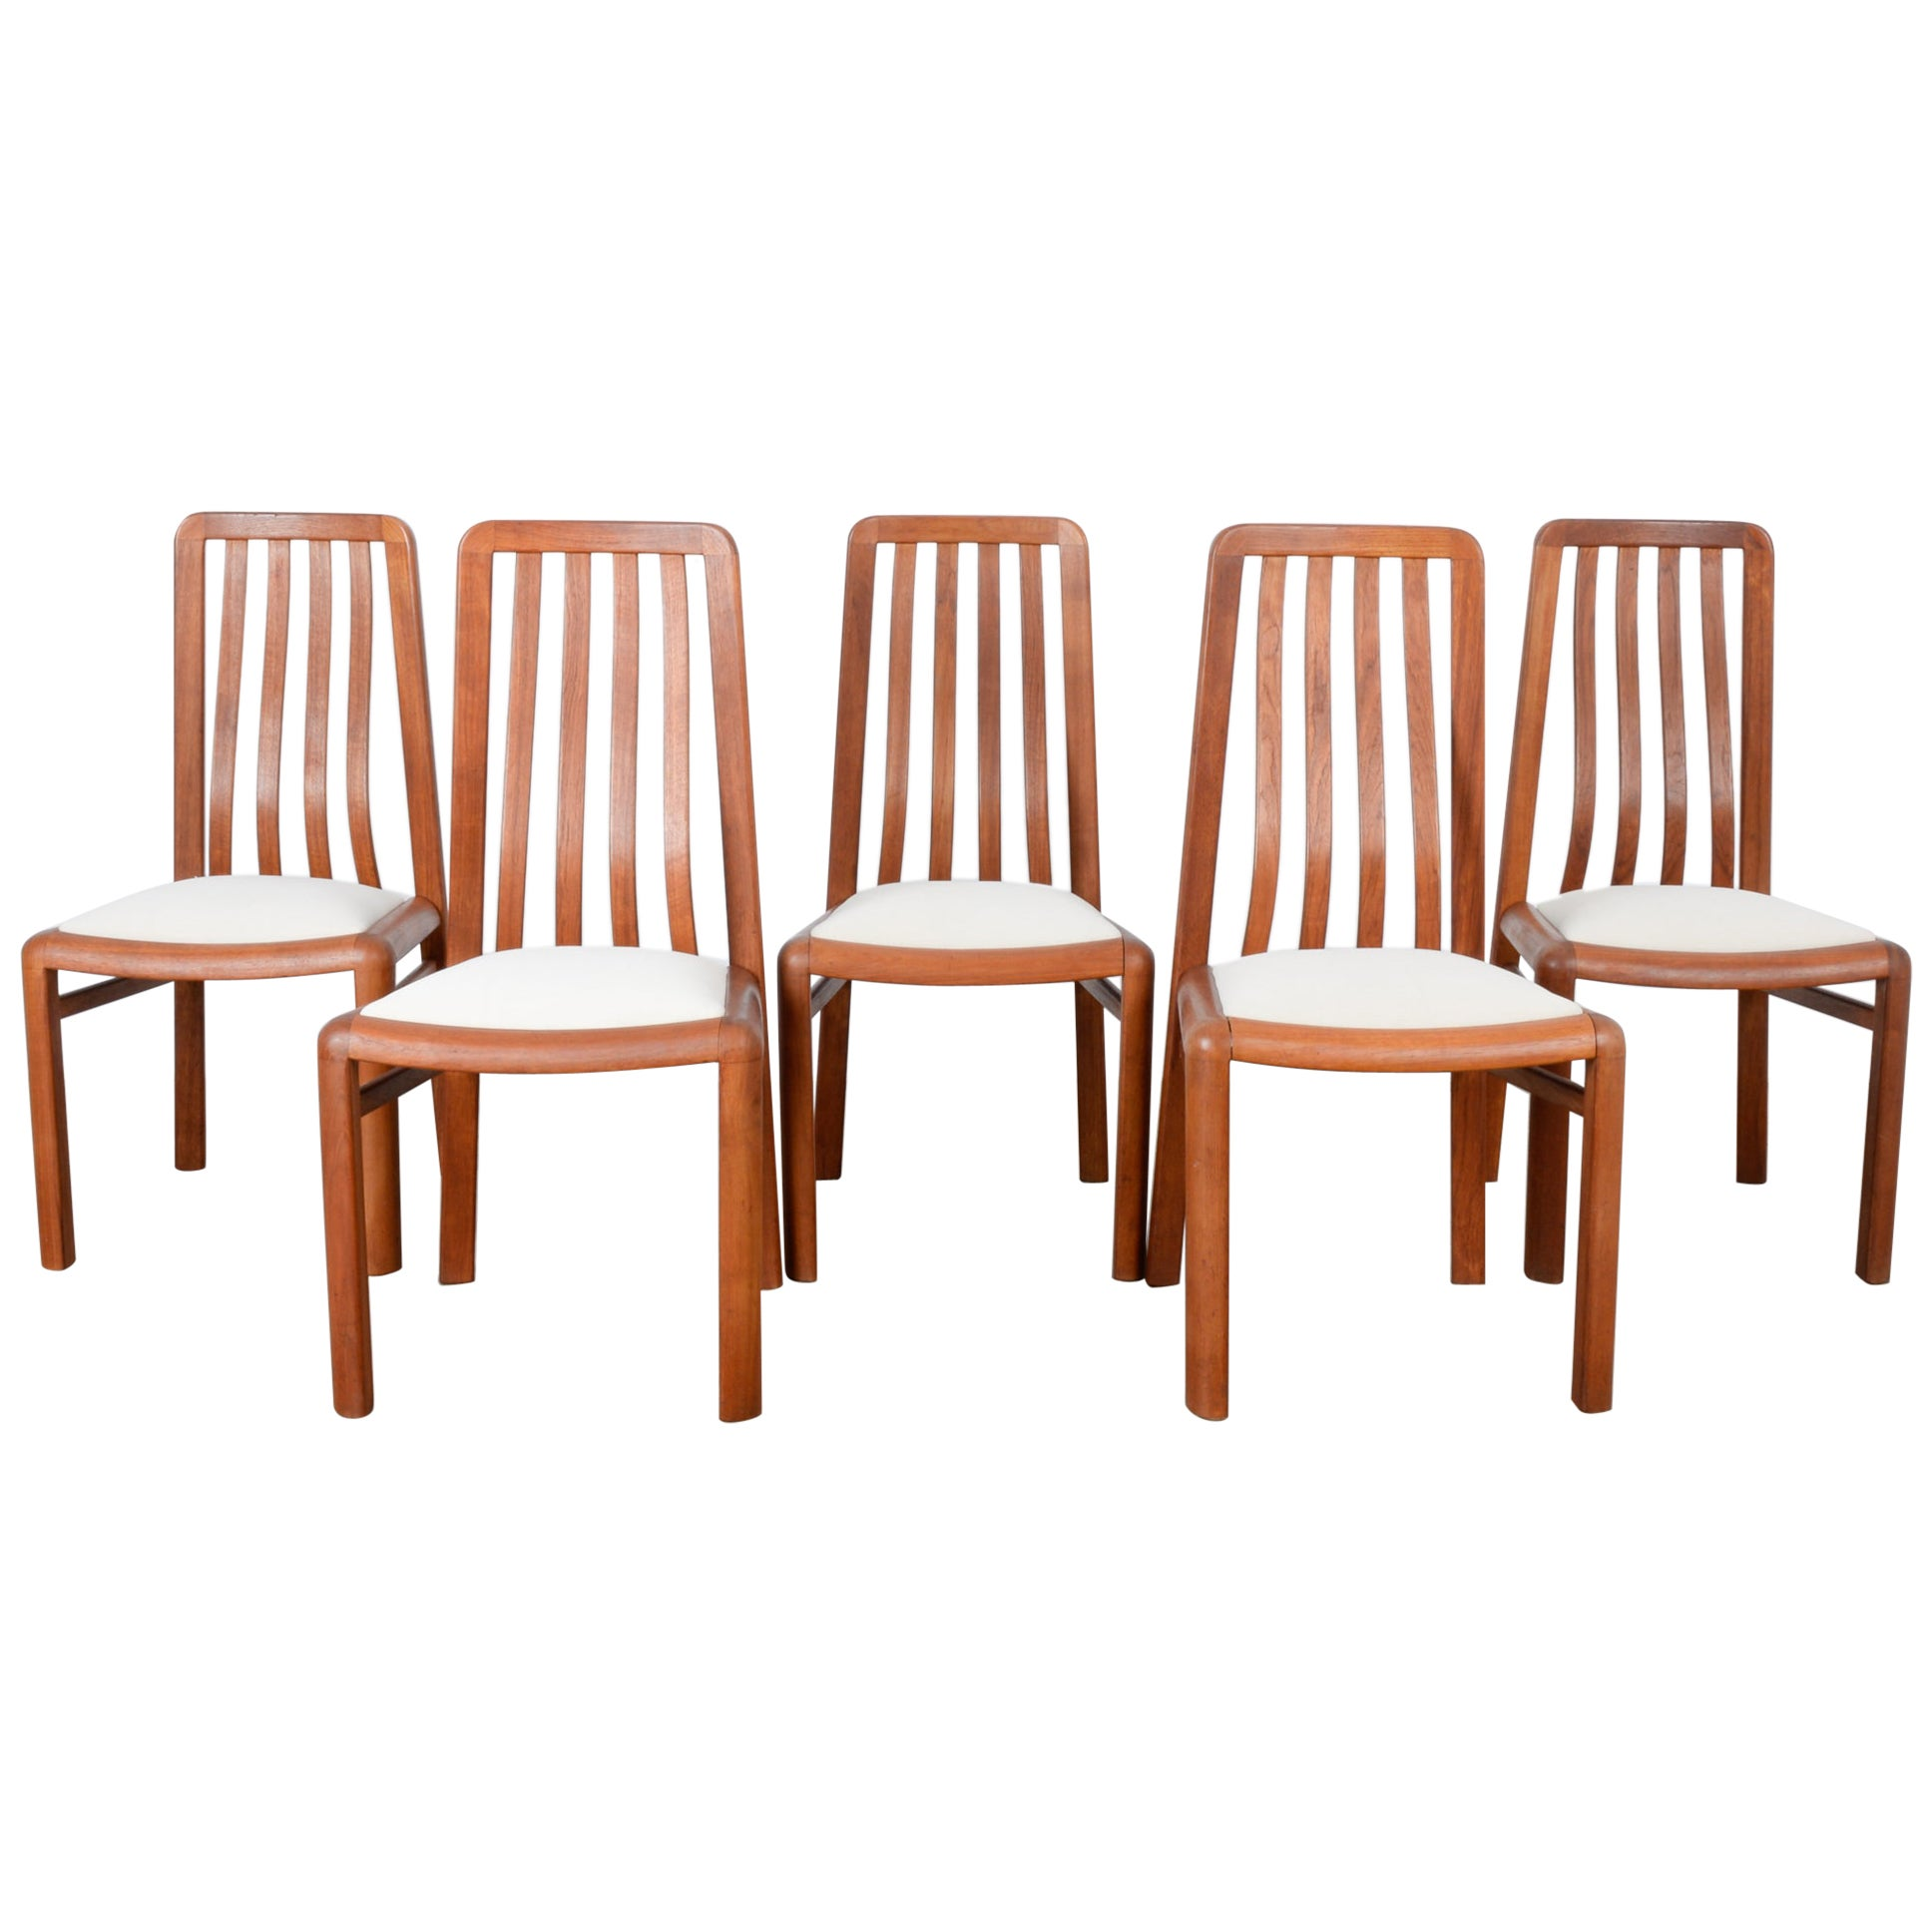 1970s Danish Modern Teak Dining Chairs, Set of Five